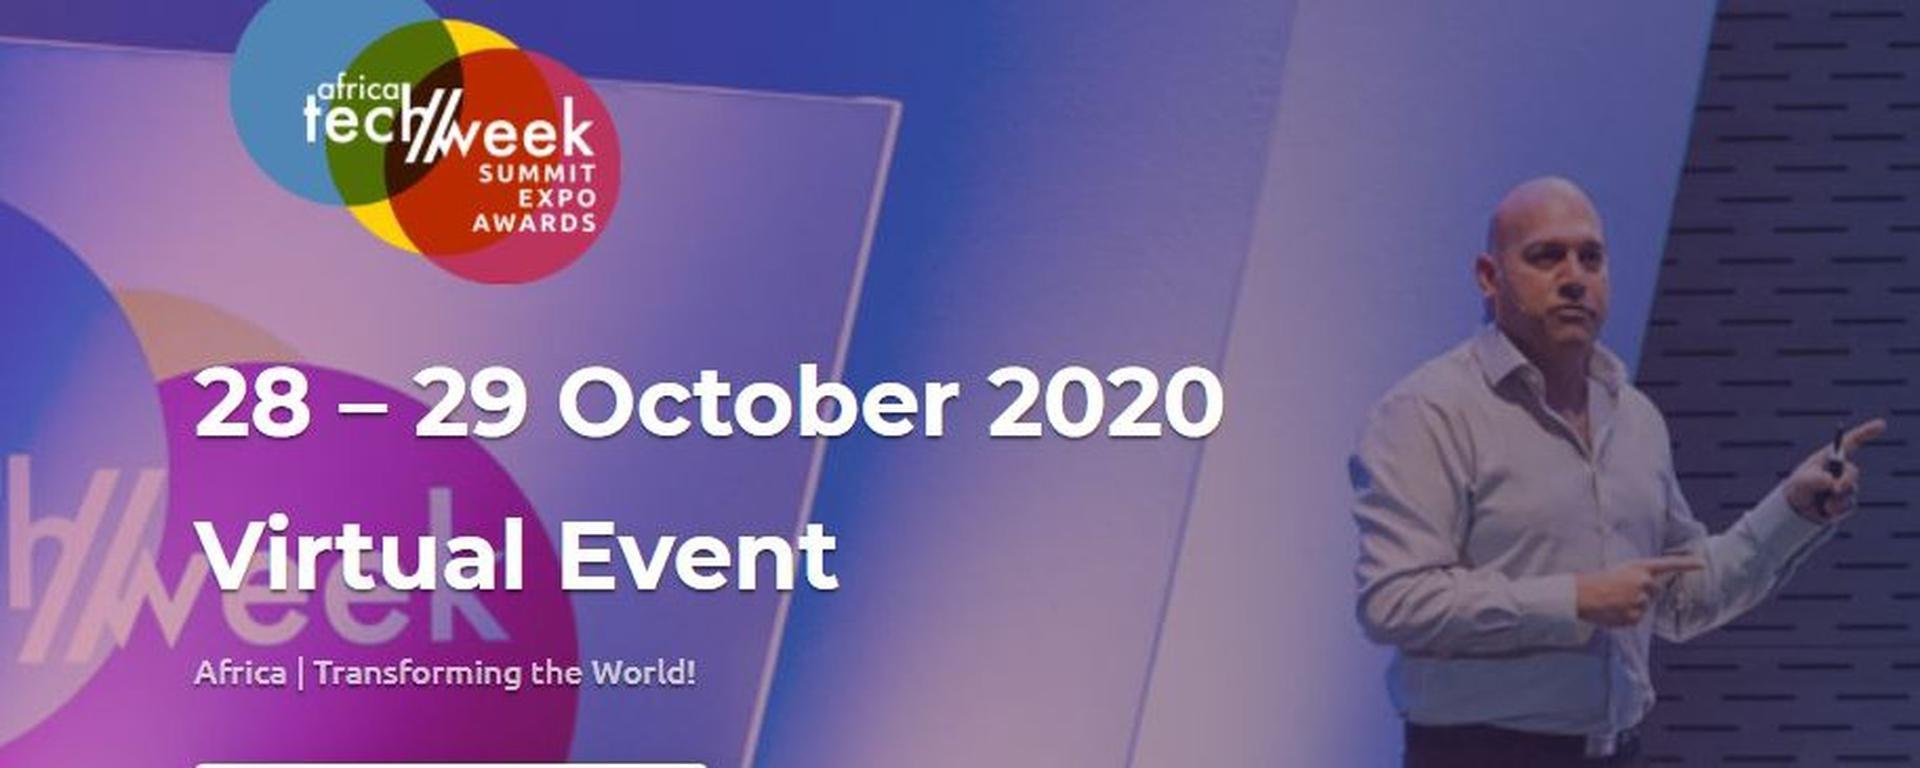 Africa Tech Week - Africa Tech Week: Transforming the World Movemeback African event cover image